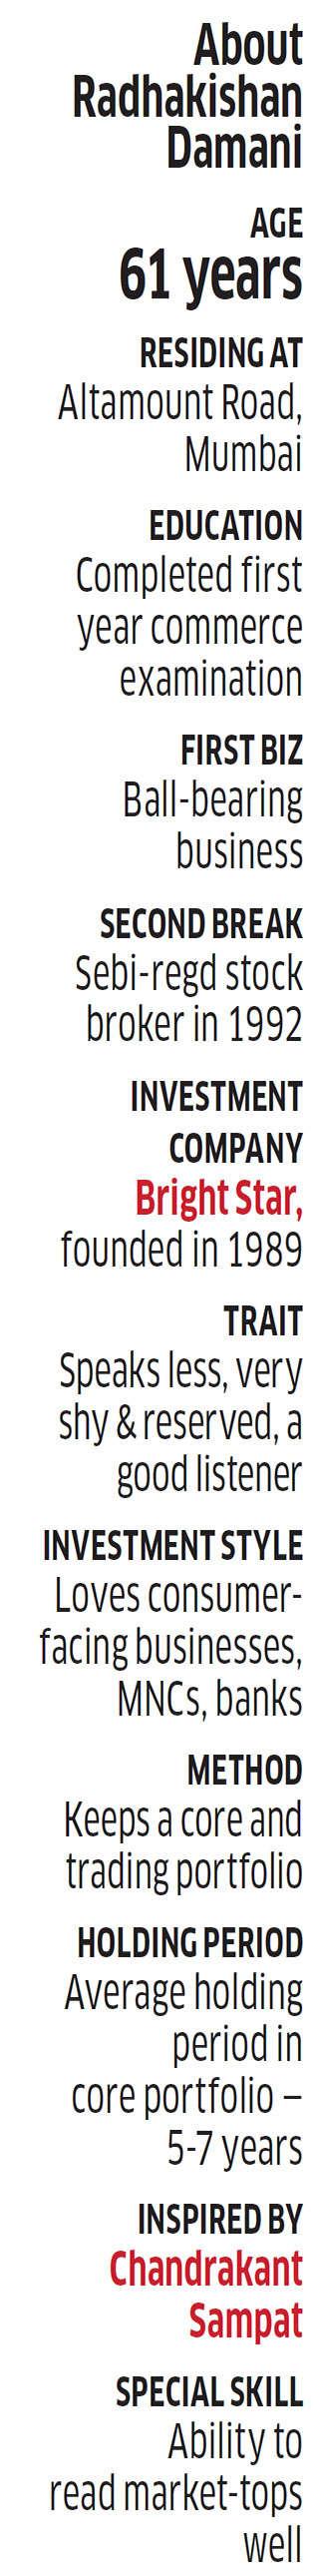 Radhakishan Damani: His journey from Dalal Street punter, to long-term investor, to entrepreneur